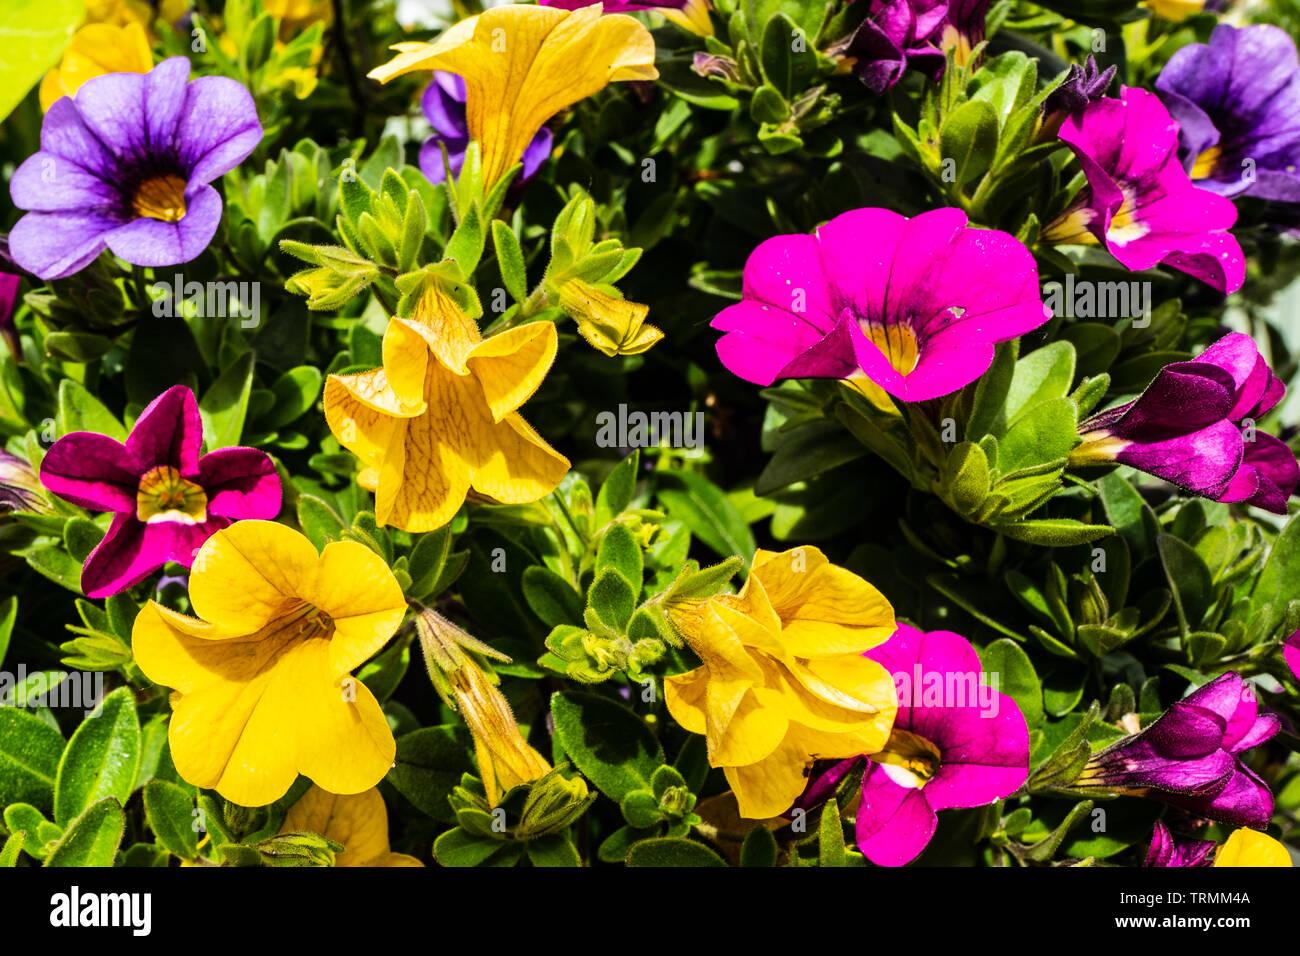 Vibrant mixed  Petunia flowers - Stock Image